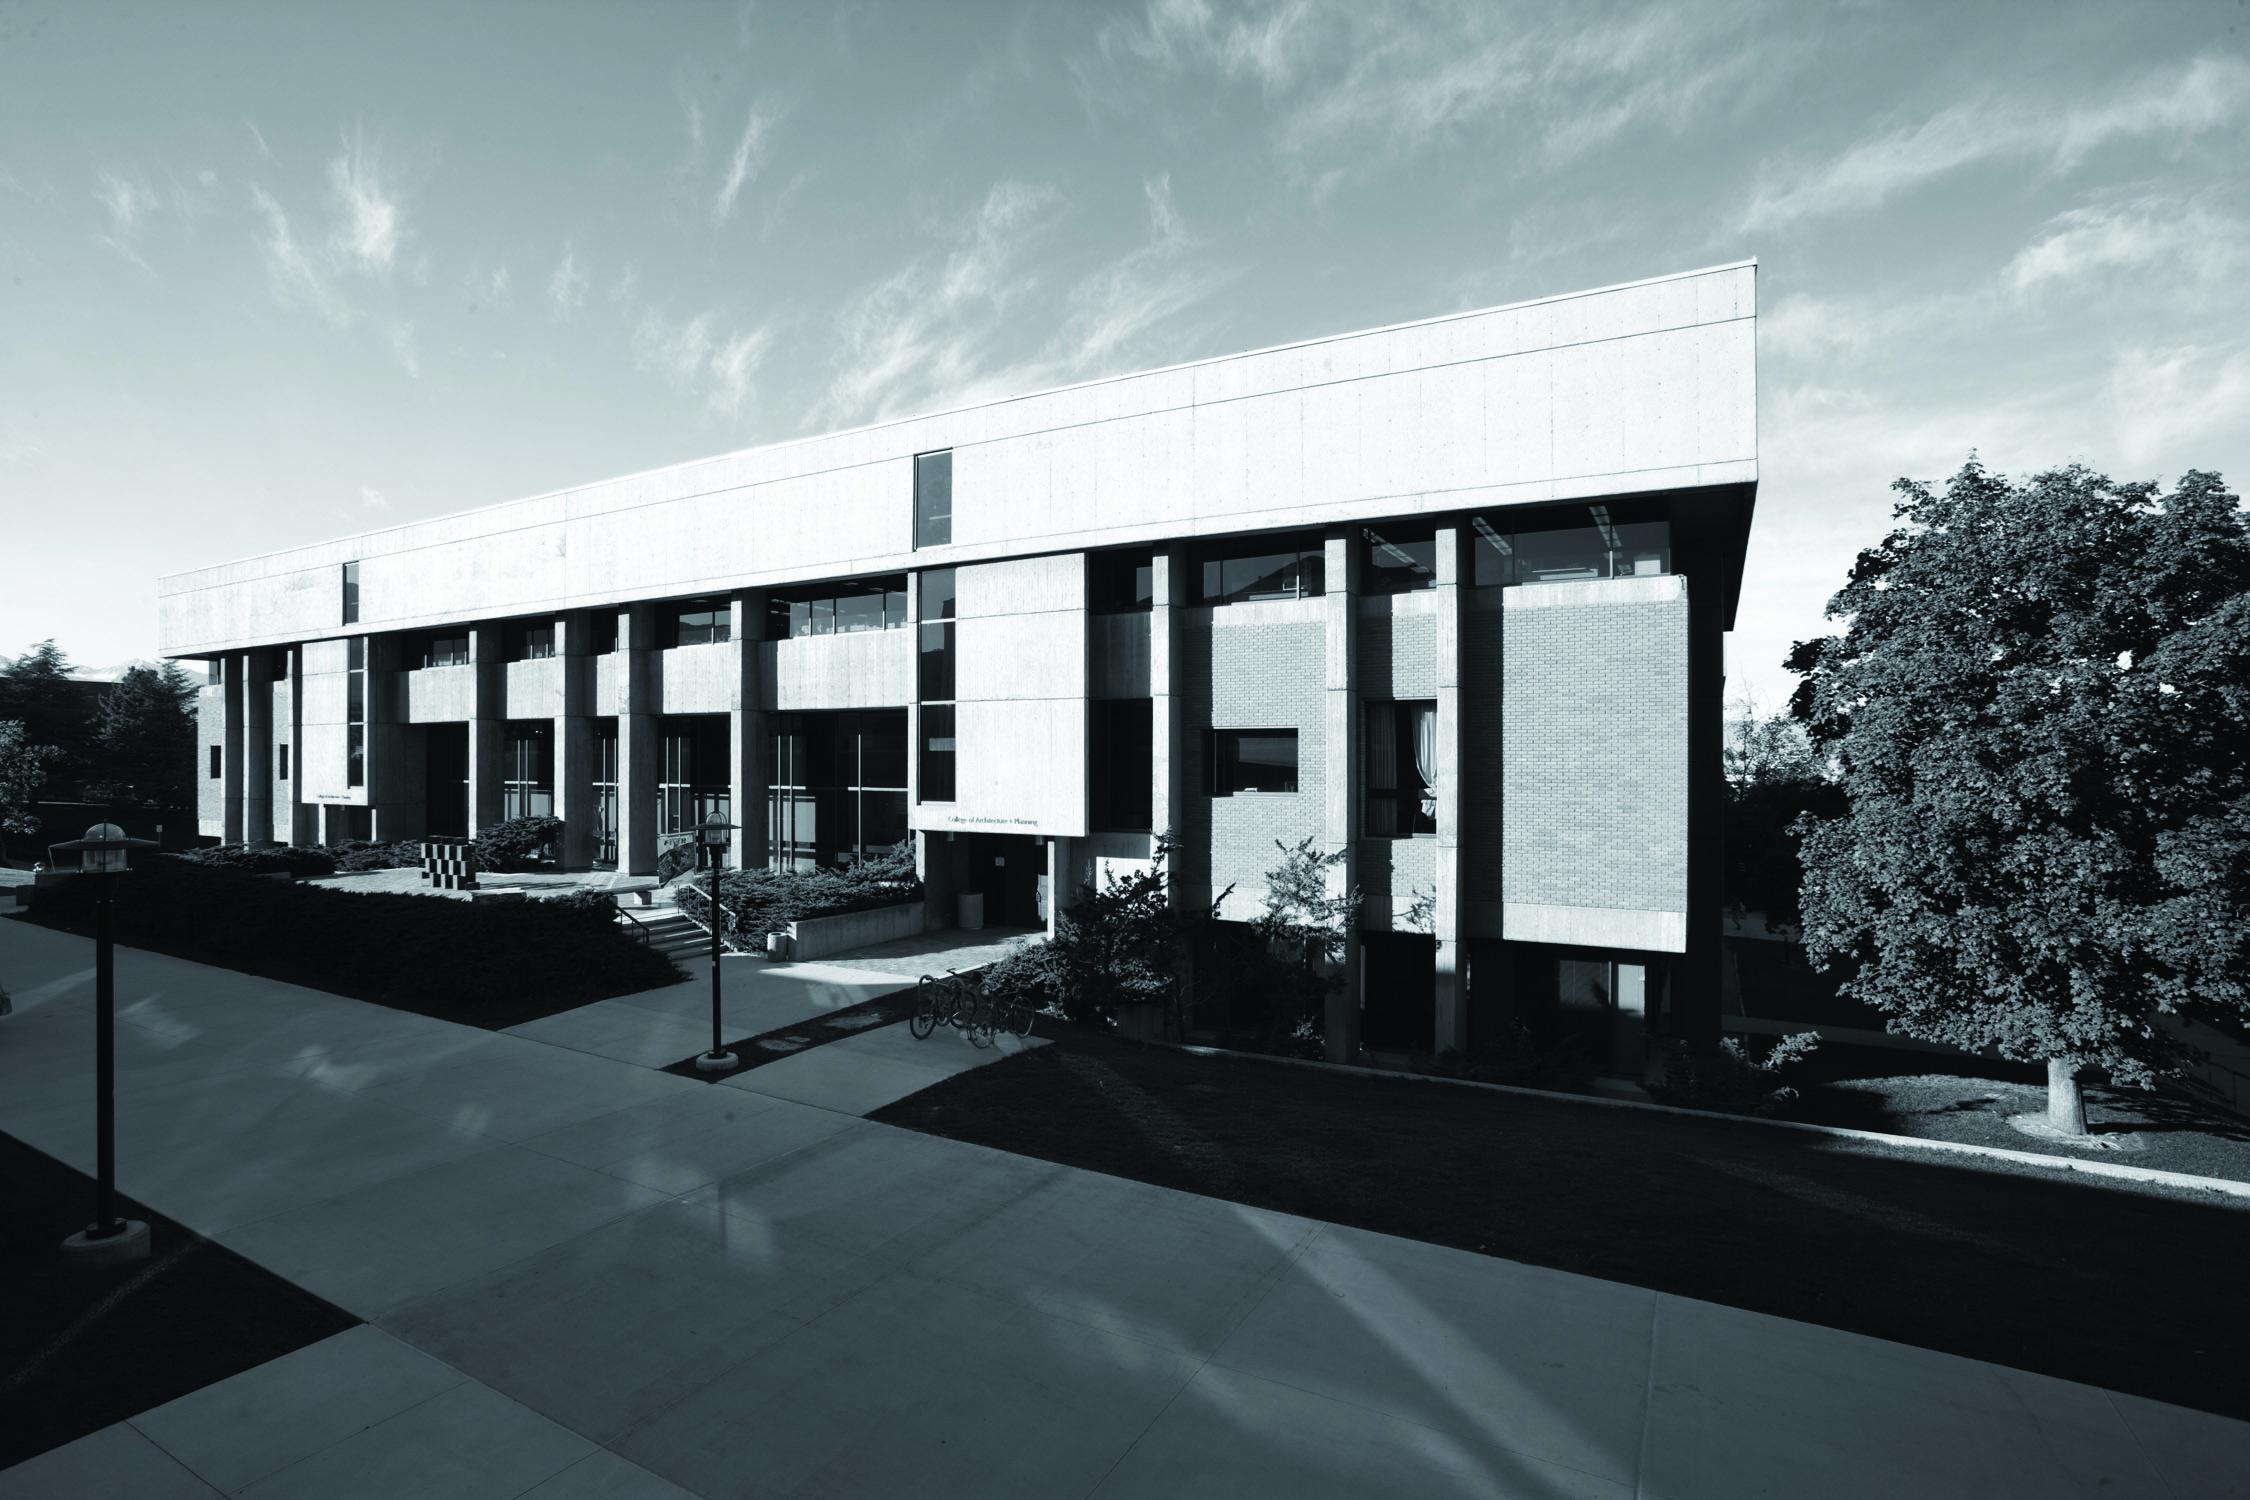 Net zero retrofit of 1970 Architecture building is part of the U's commitment to reduce energy consumption.